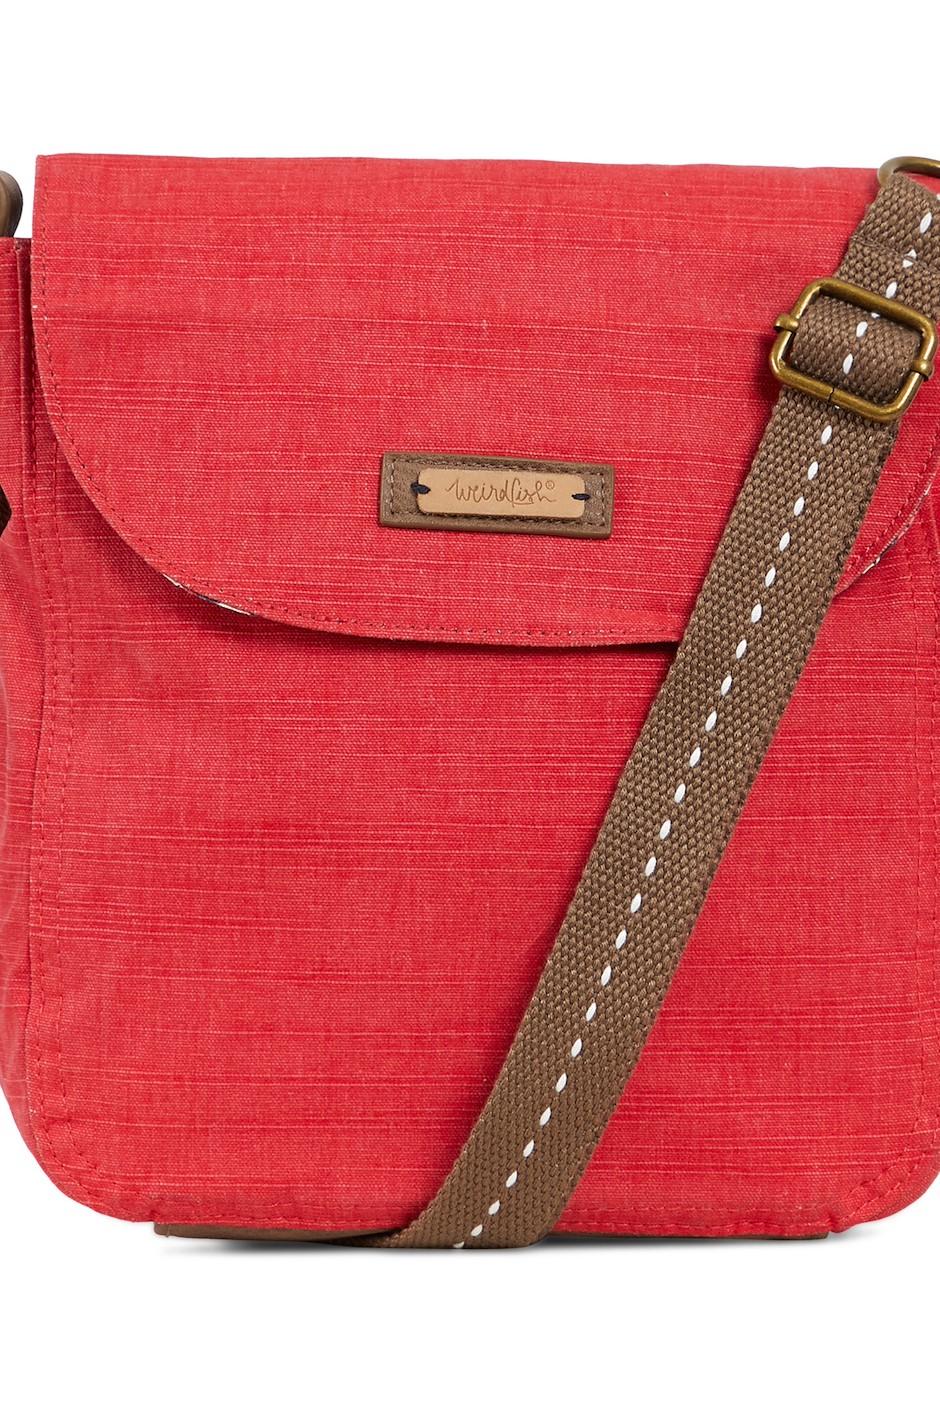 Loula Plain Cross Body Bag Radical Red